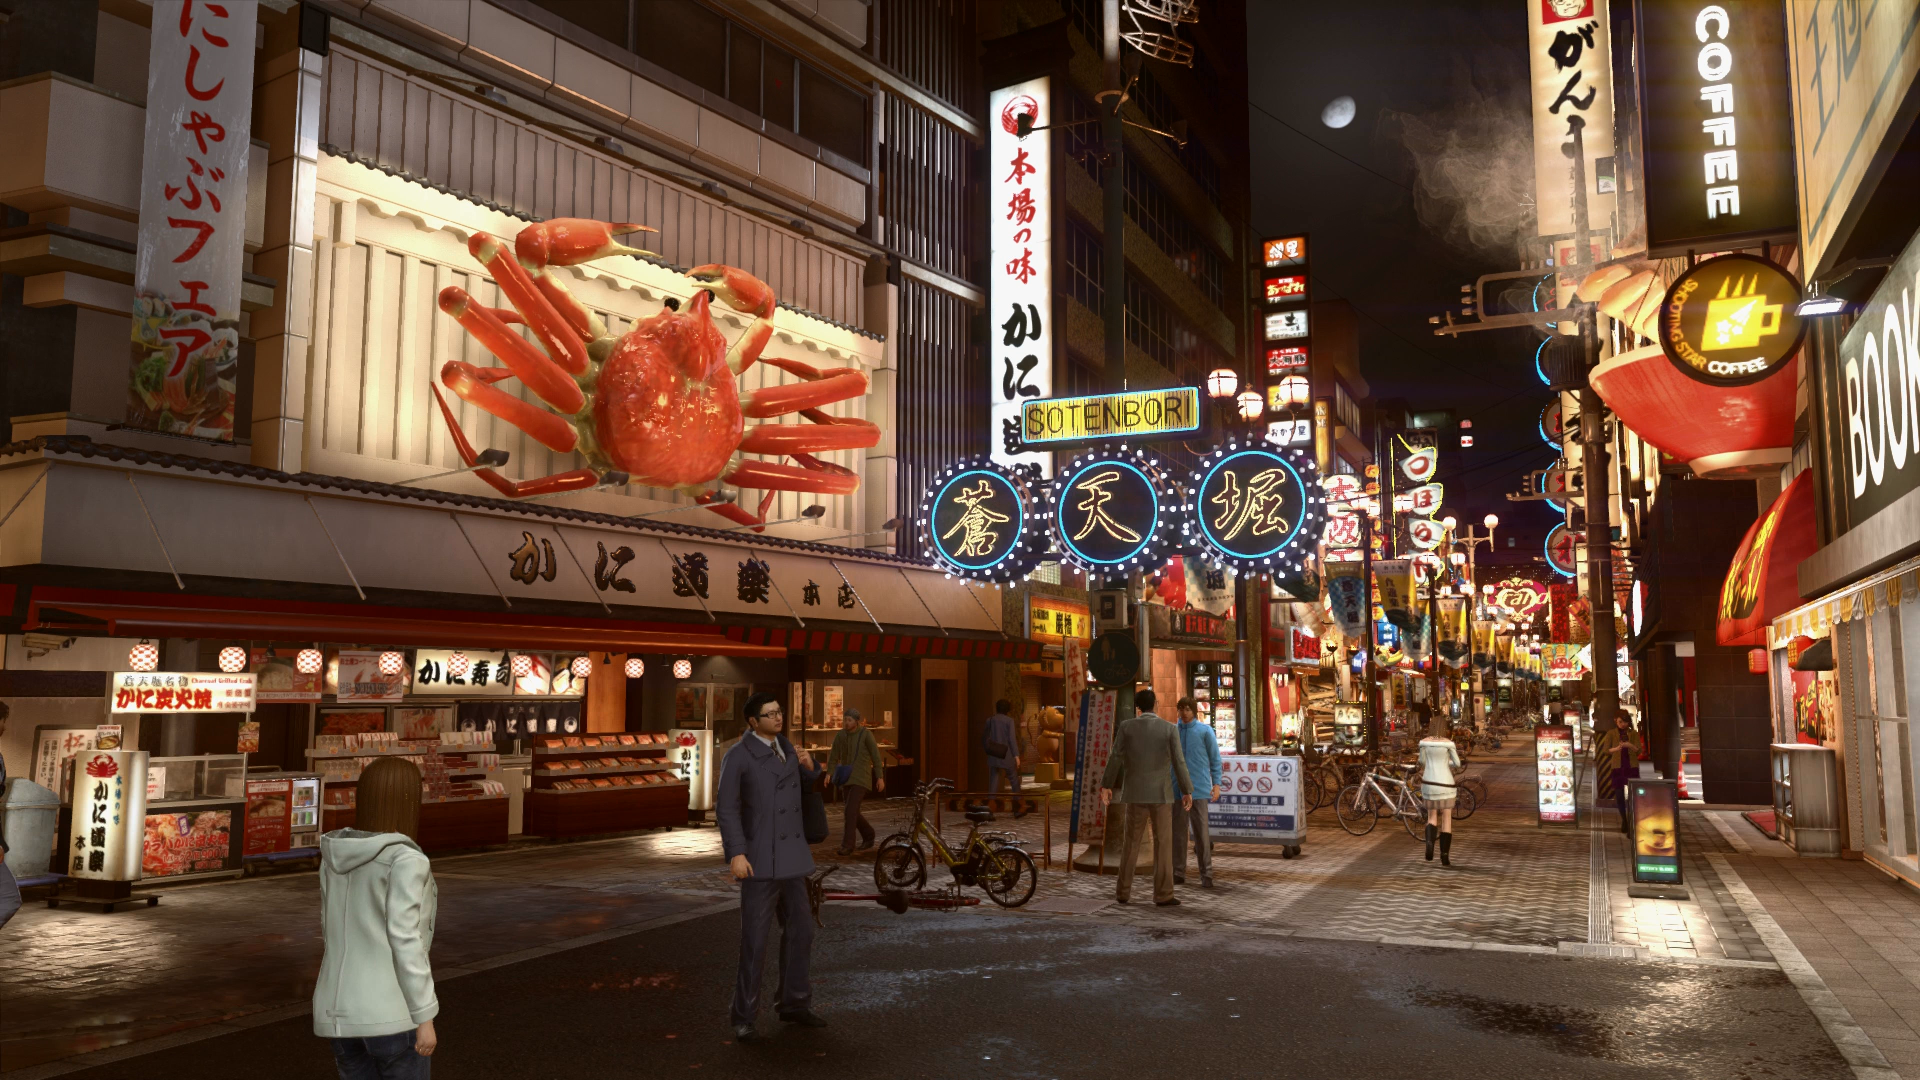 Yakuza Kiwami 2 demo impressions preview Sotenbori